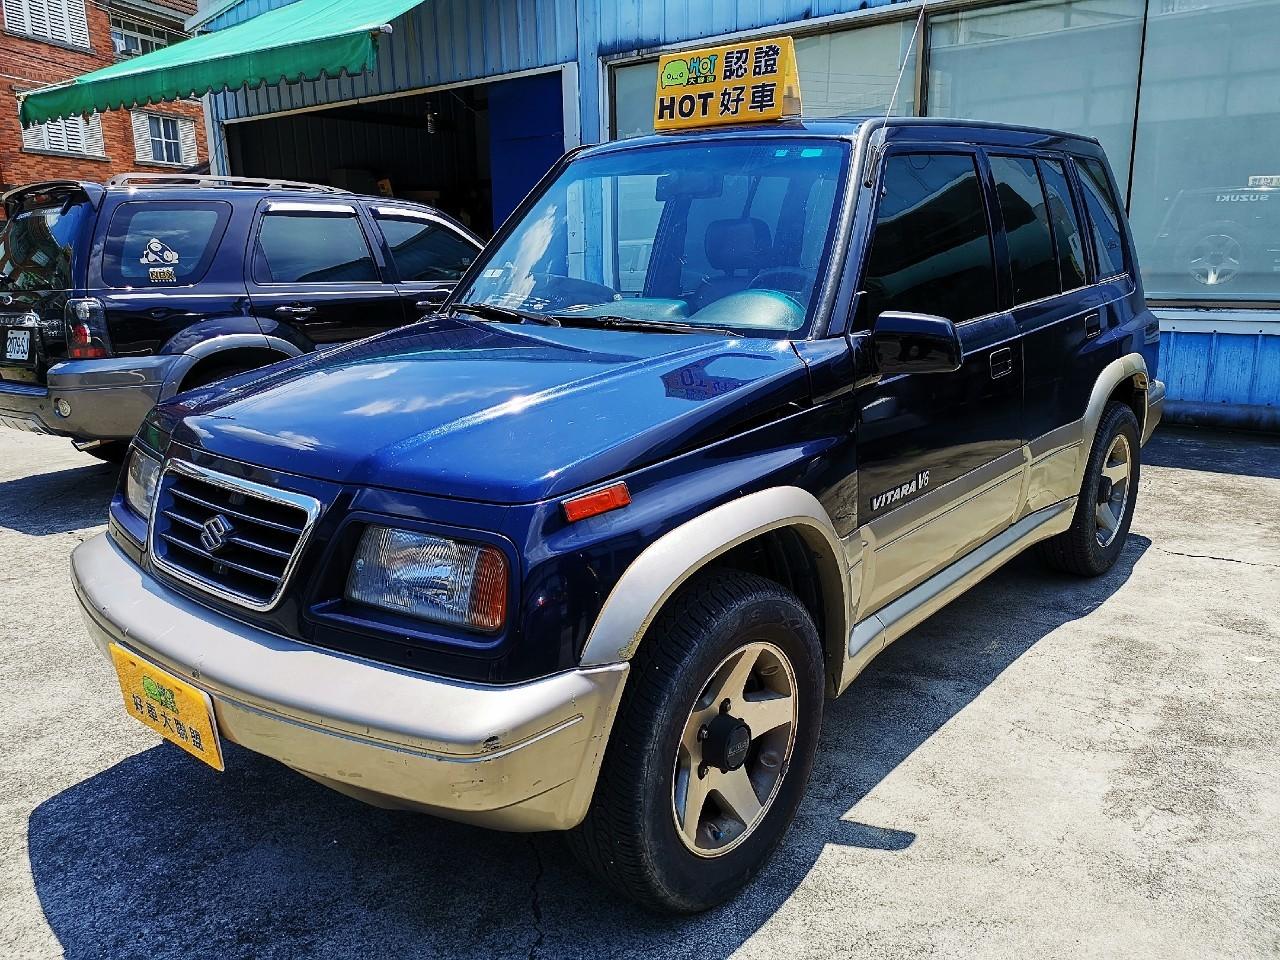 1996 Suzuki 鈴木 Vitara